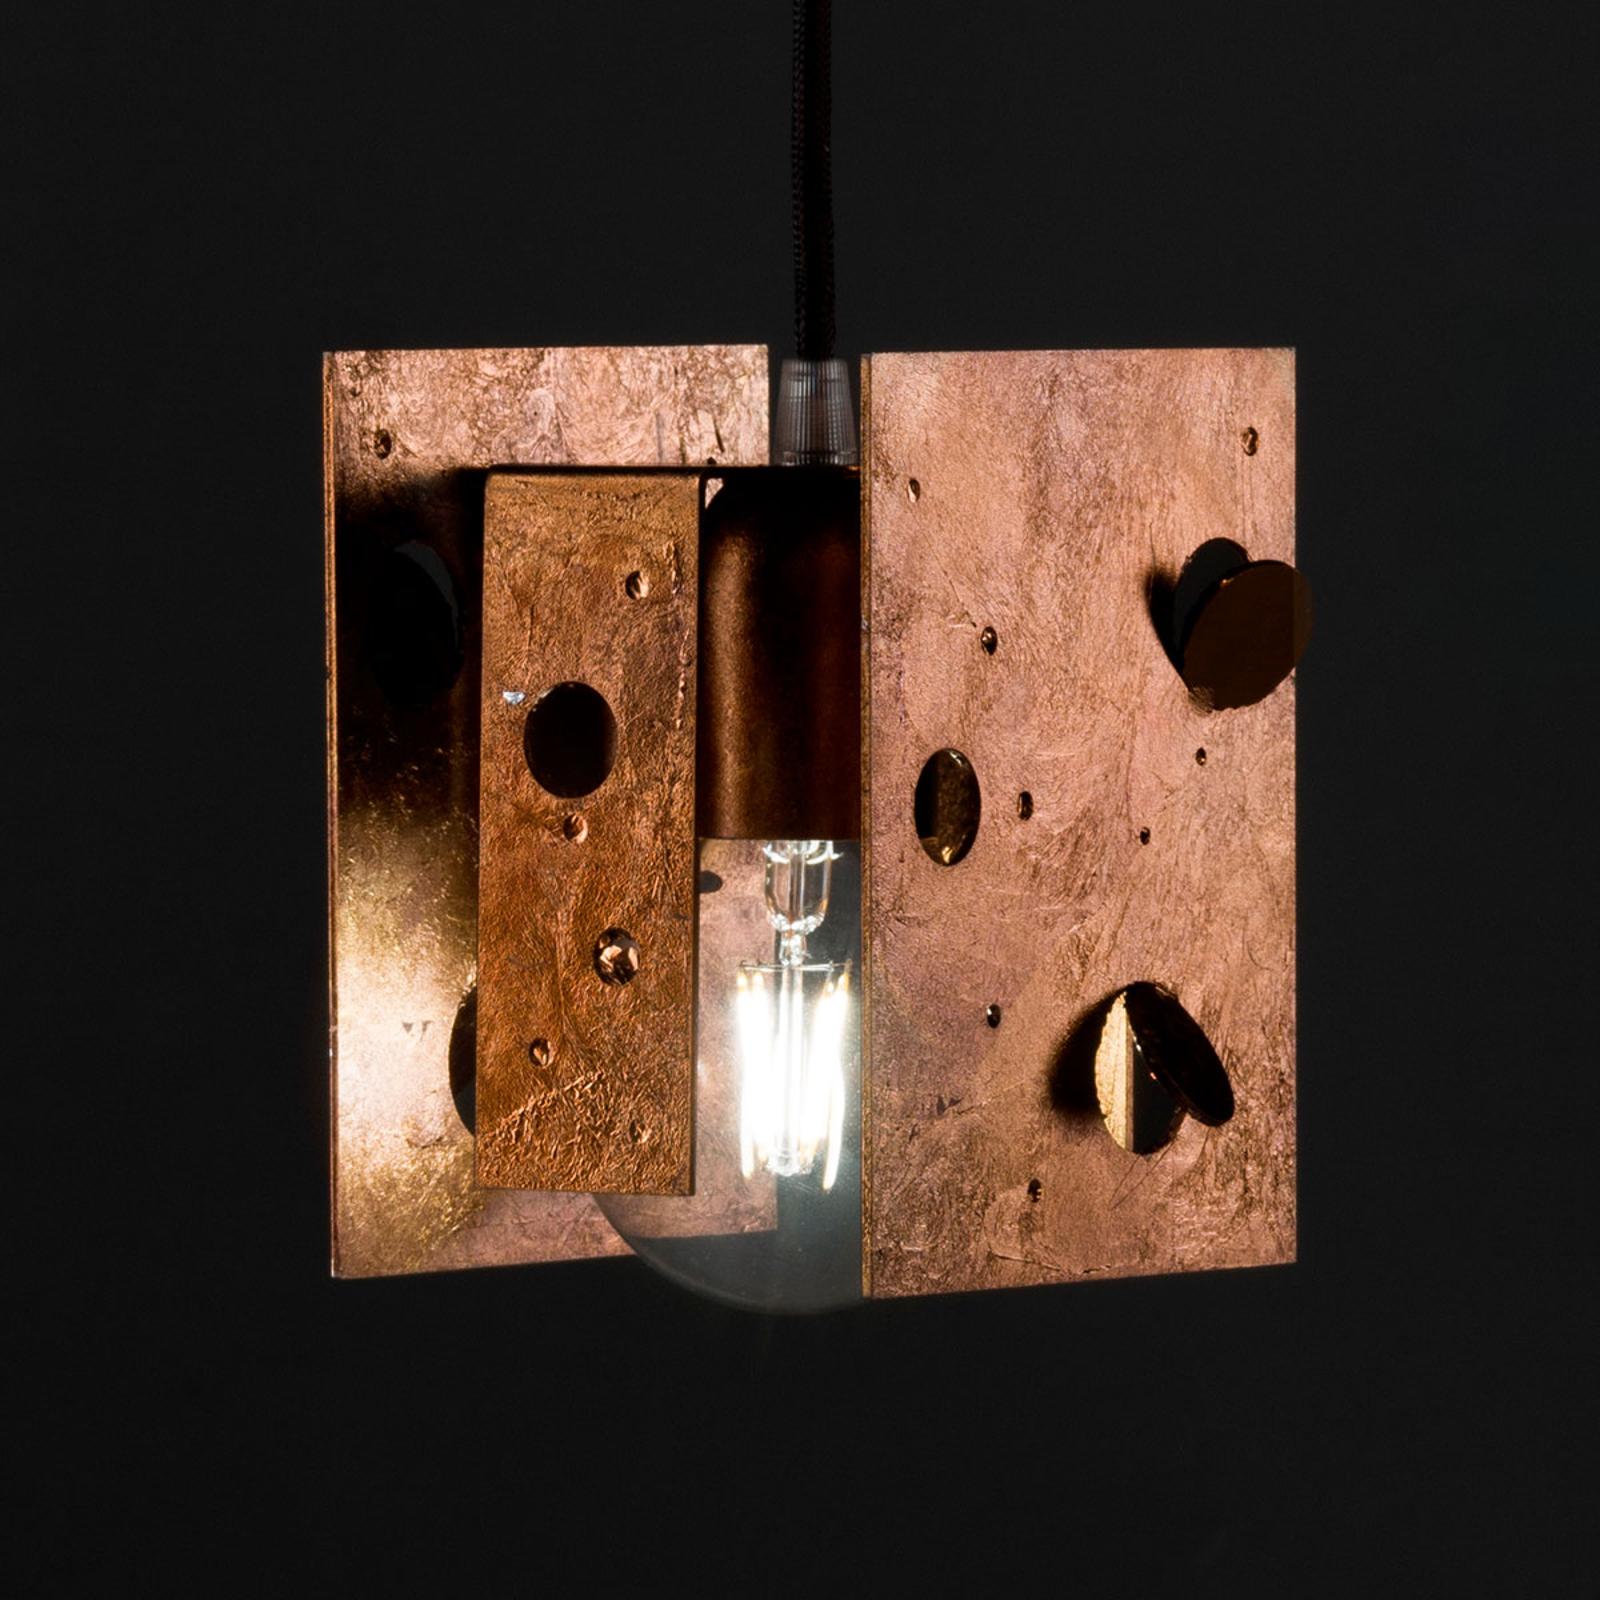 Knikerboker Buchi hanglamp 13x11x16,5 koper